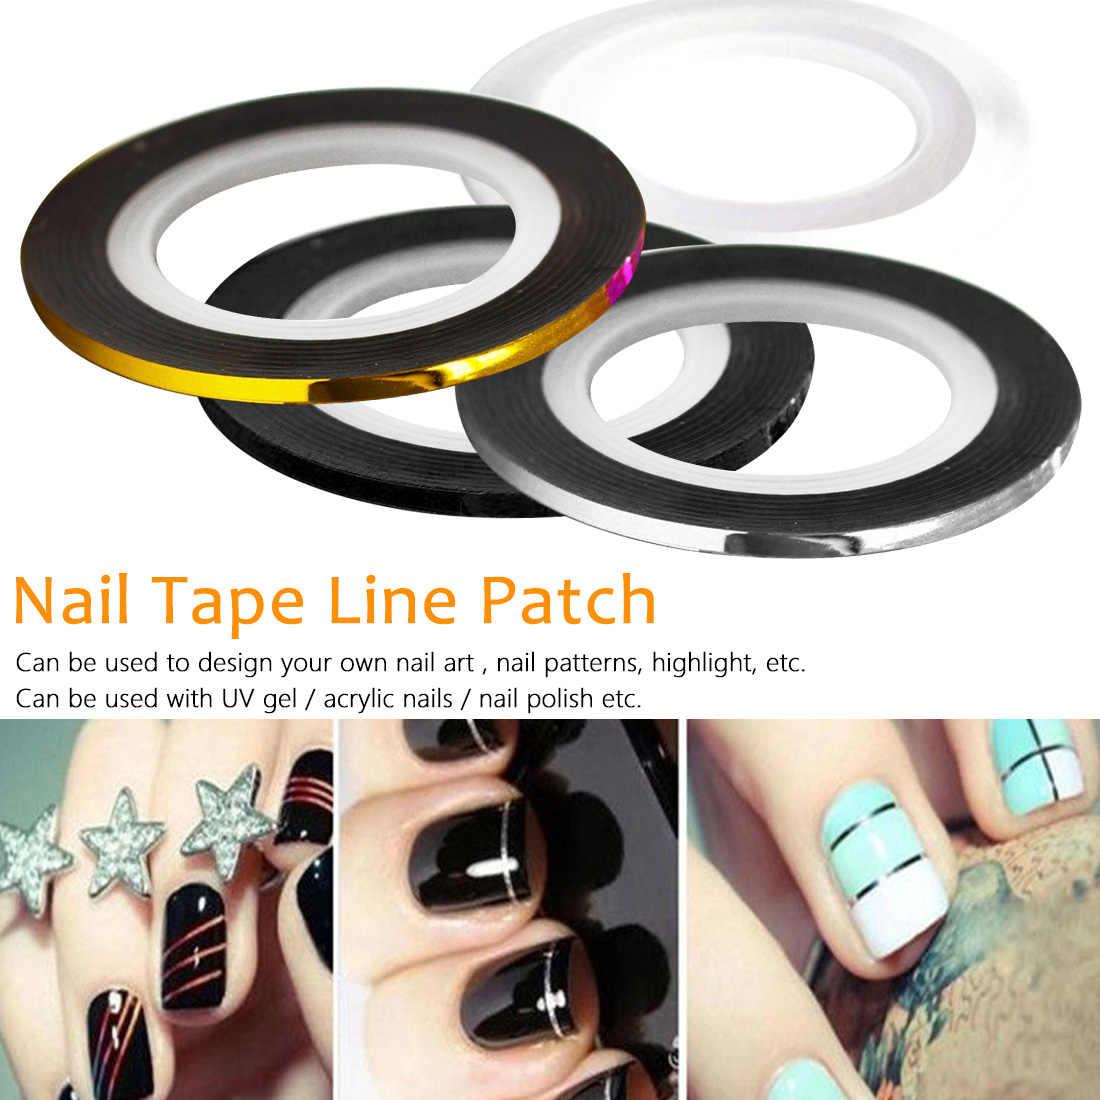 1 Buah Alat Manikur Alat 1 Mm 2 Mm 3 Mm Kecantikan Roll Stripping Stiker Foil Kuku Seni Tape Line DIY Baru Perak/Emas/Hitam/Putih